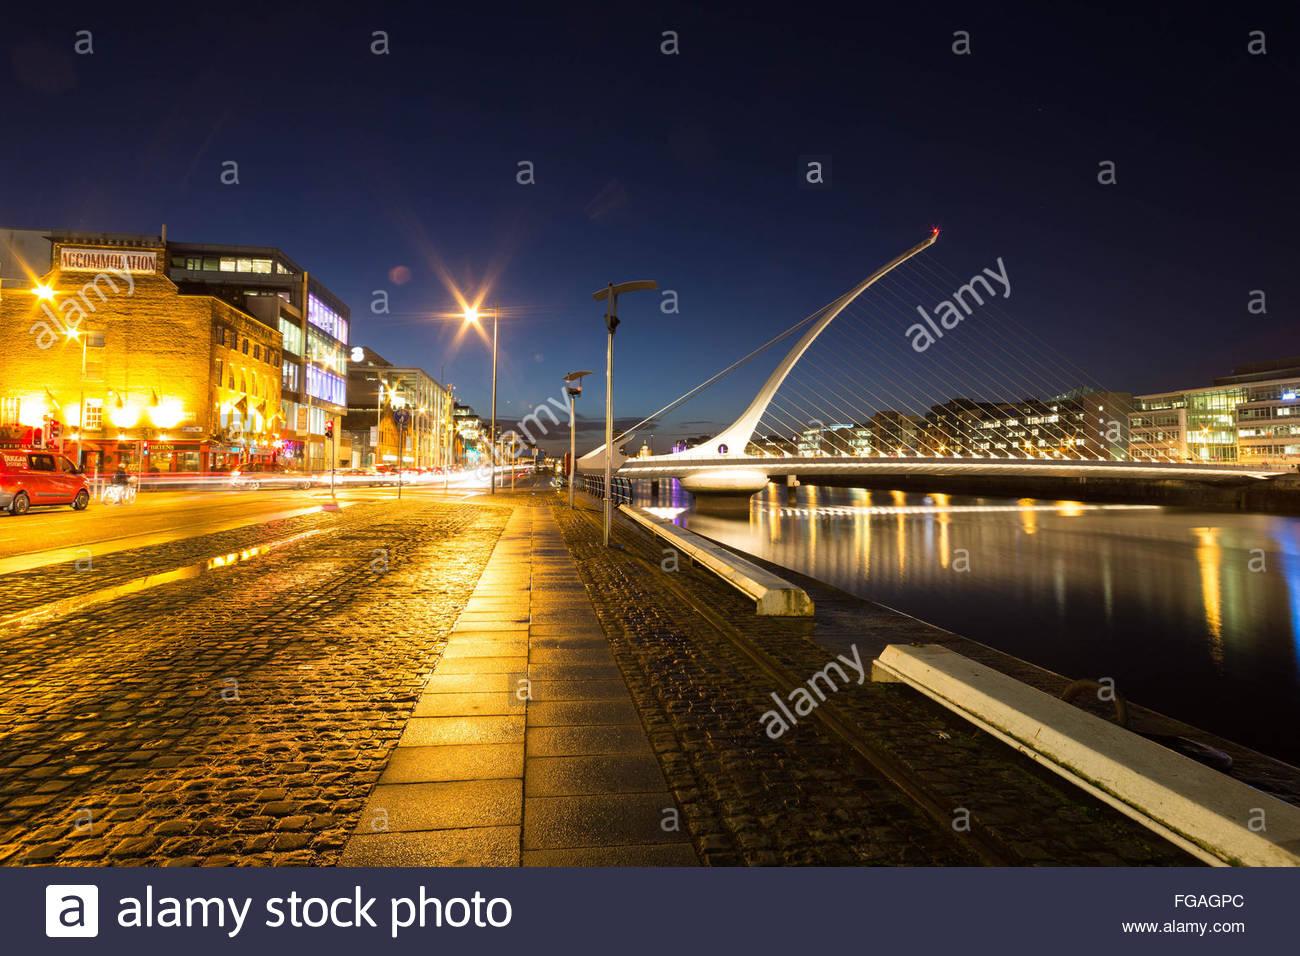 Illuminated Samuel Beckett Bridge Over River Against Sky Stock Photo